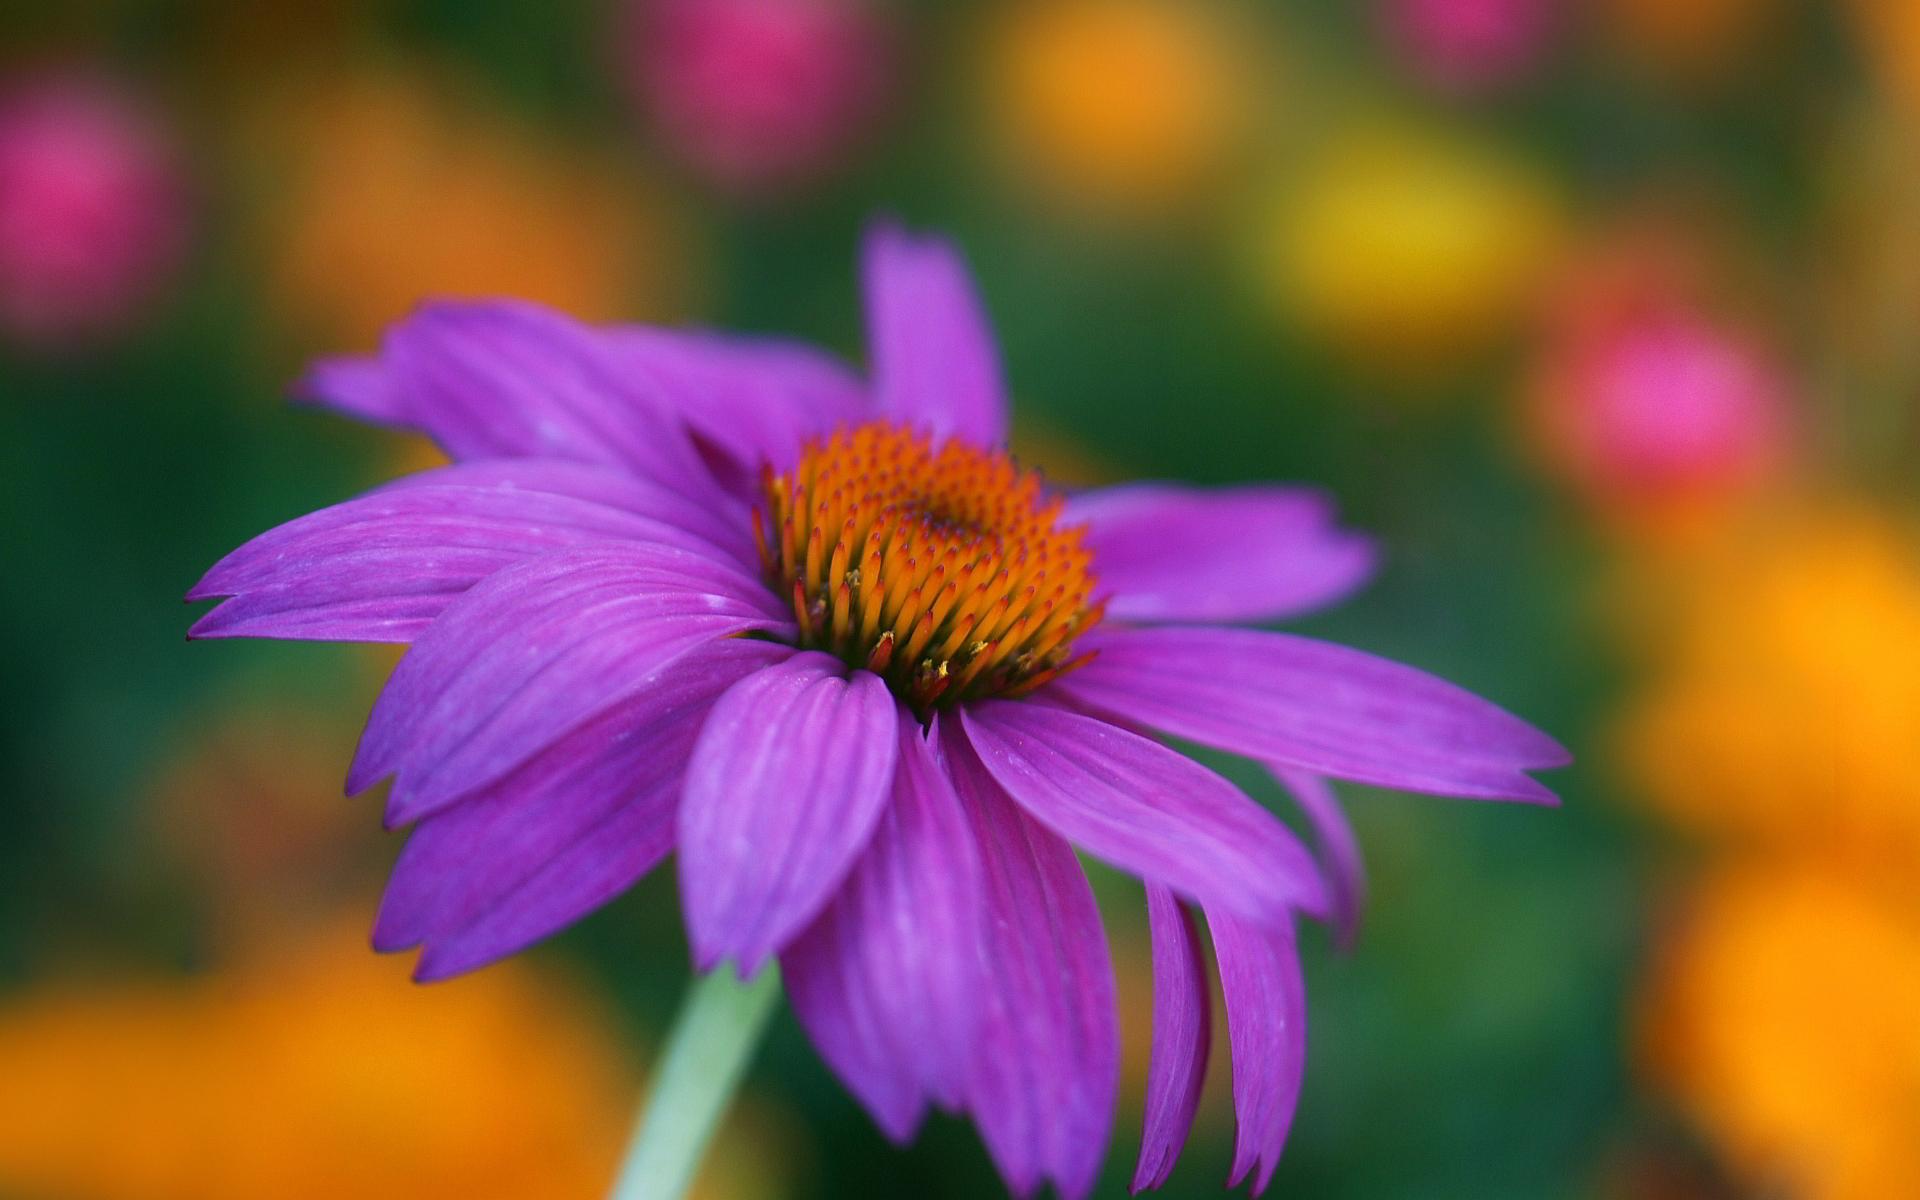 Echinacea purpurea head